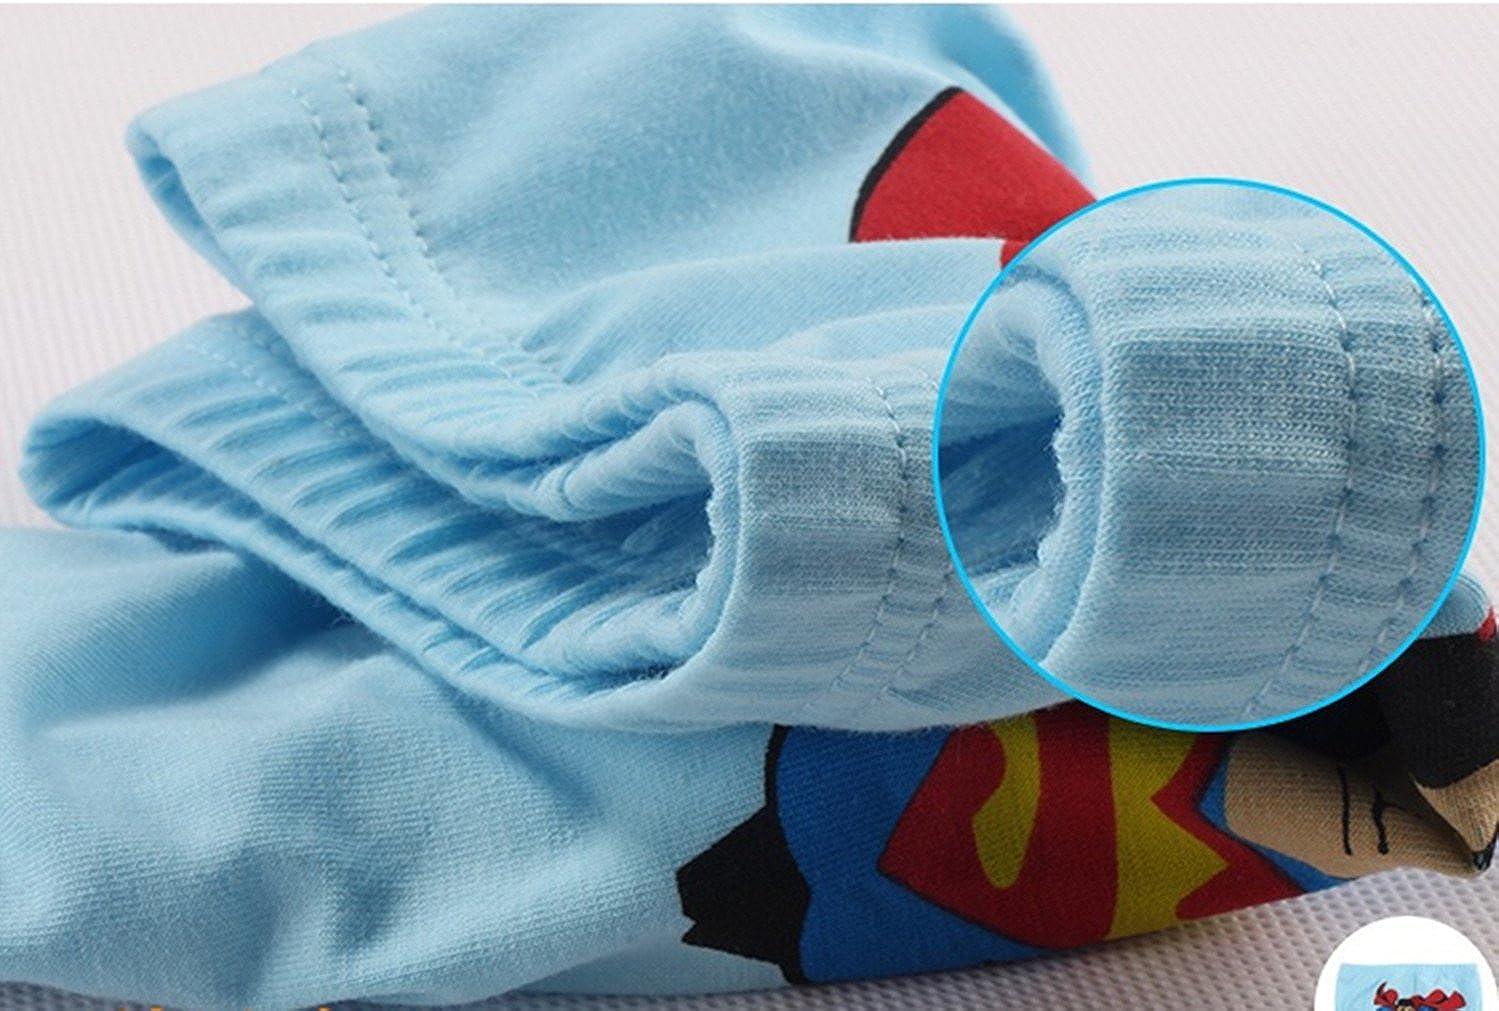 KK-Jim Kids Avengers Briefs 100/% Cotton Underwear for Little Big Boys 5 Pack of